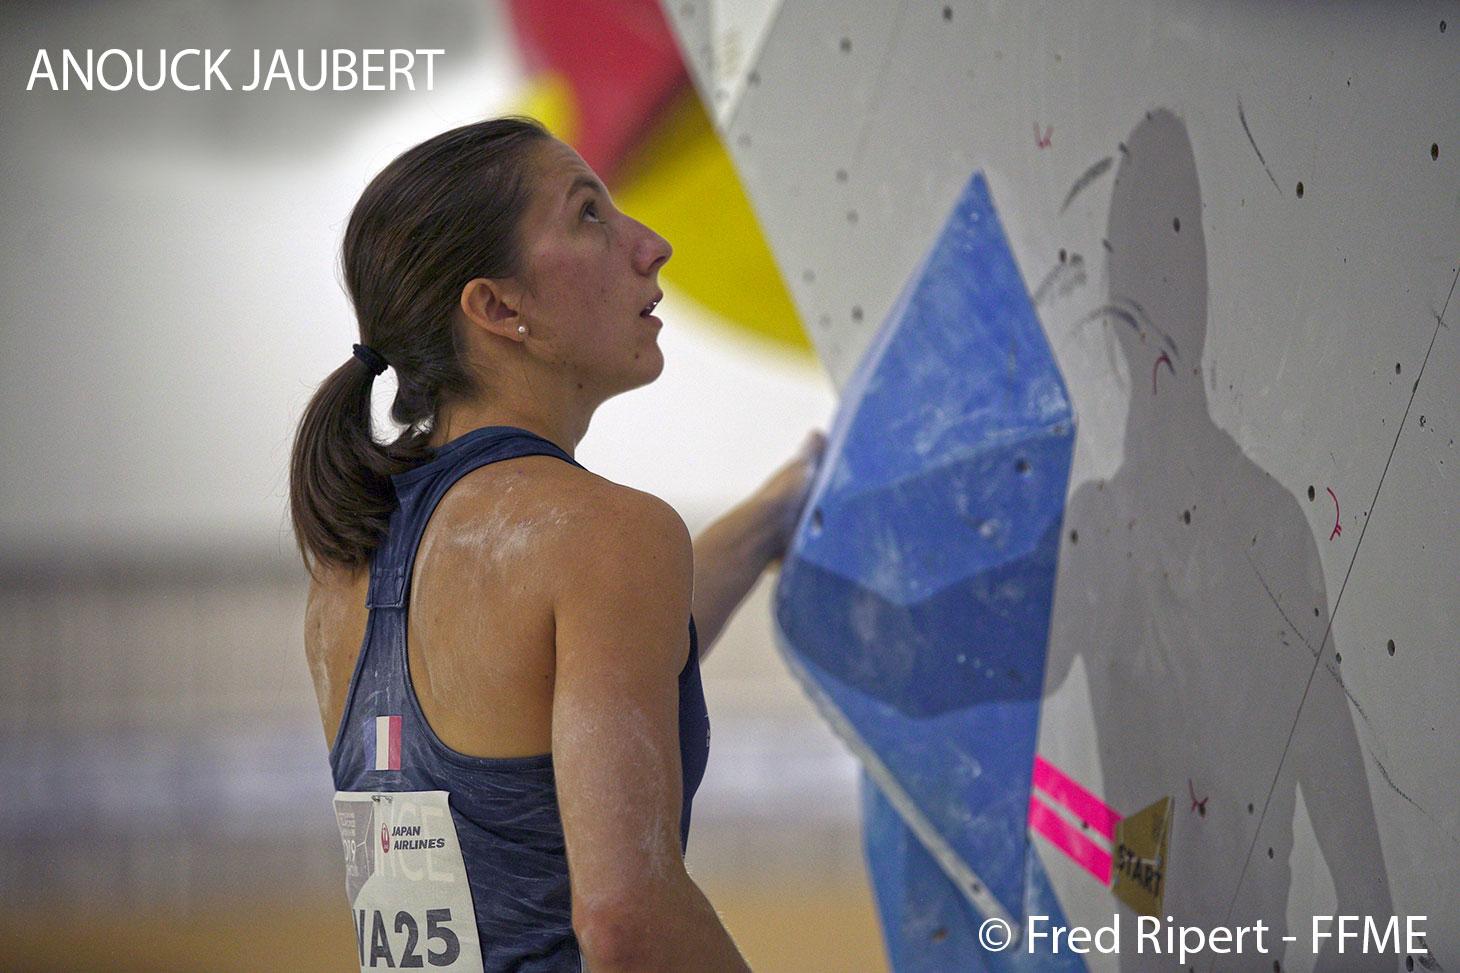 Anouck Jaubert, étudiante sportive de haut niveau à l'UGA